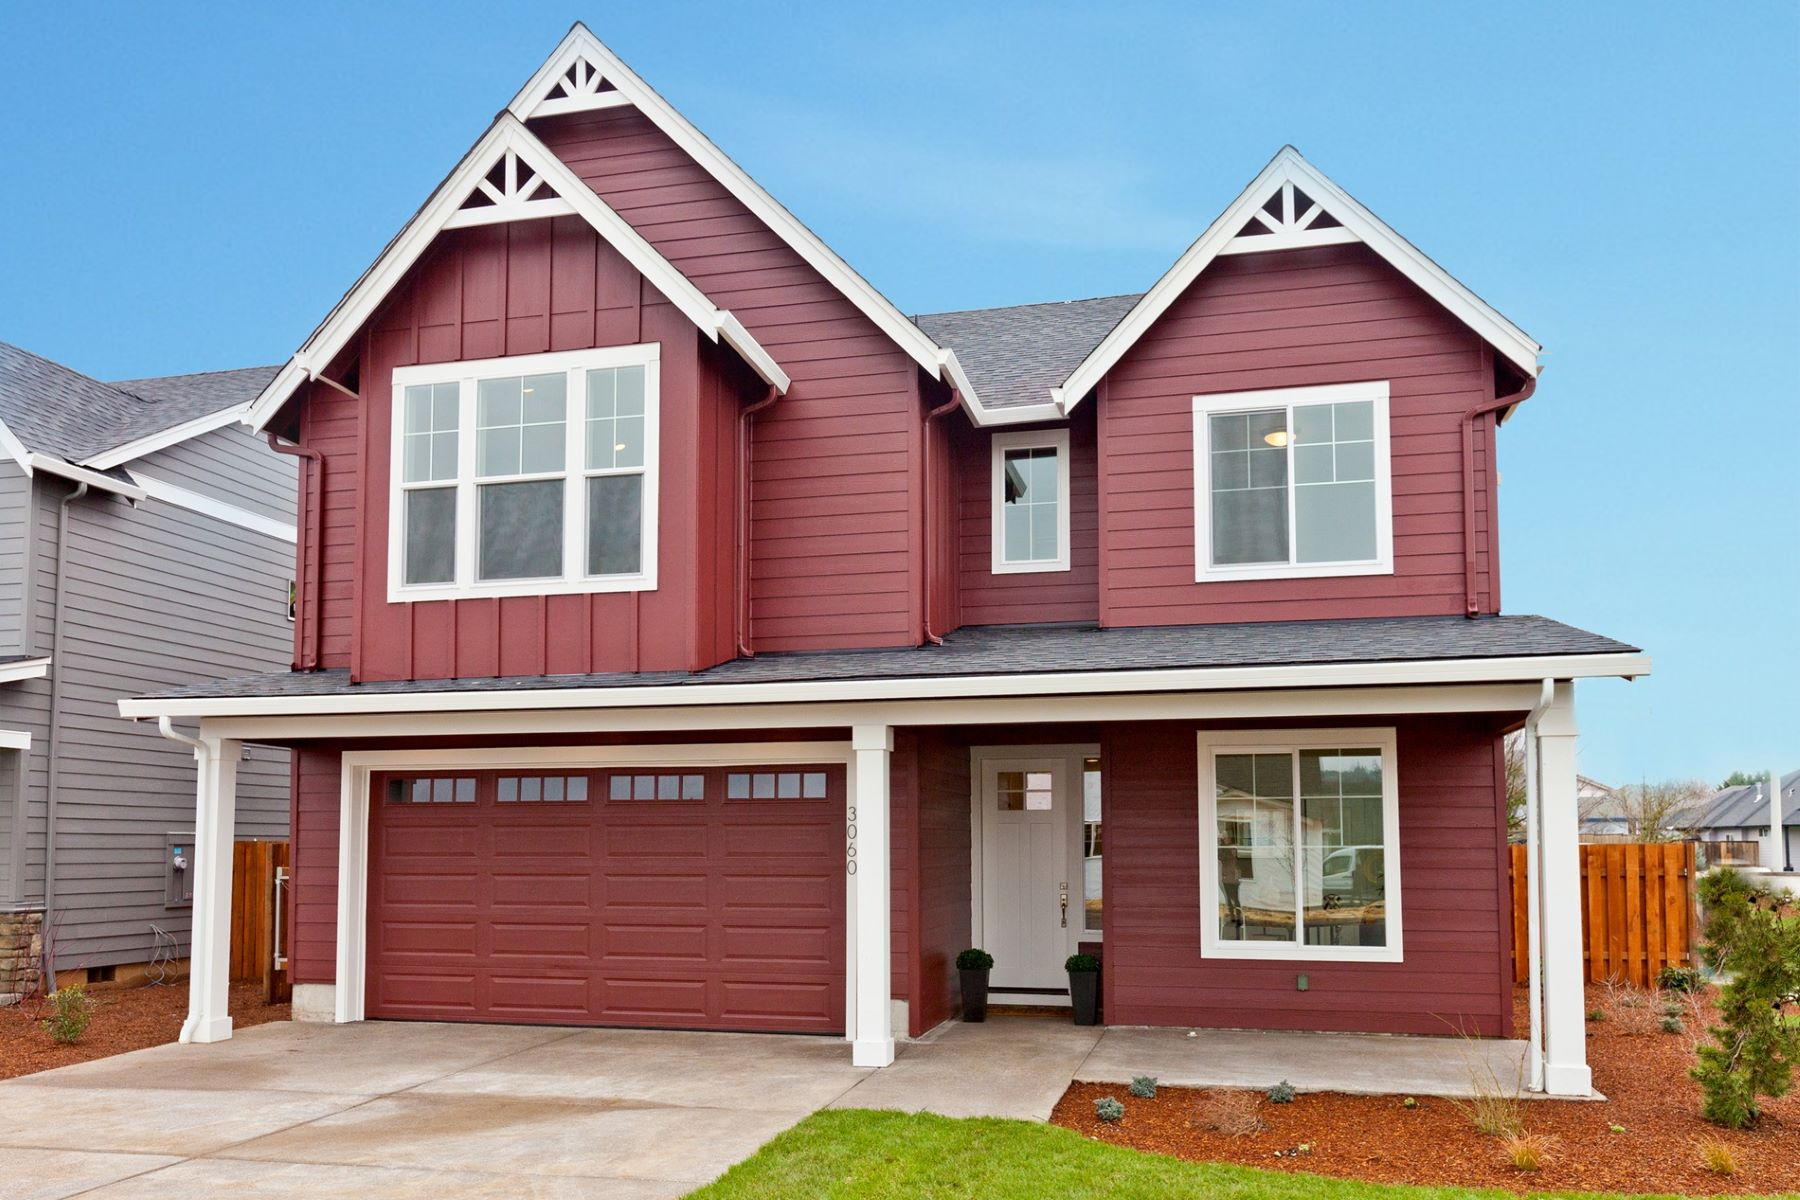 Single Family Homes for Active at 3060 NW Anastasia St Salem, Oregon 97304 United States